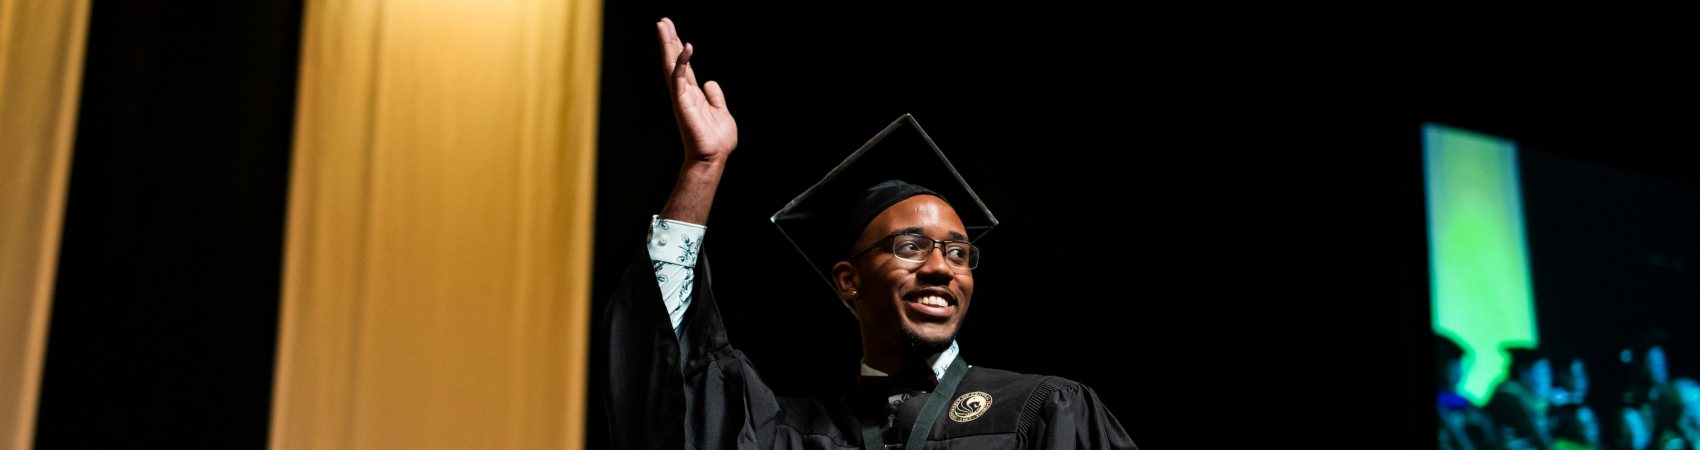 Graduate at Commencement